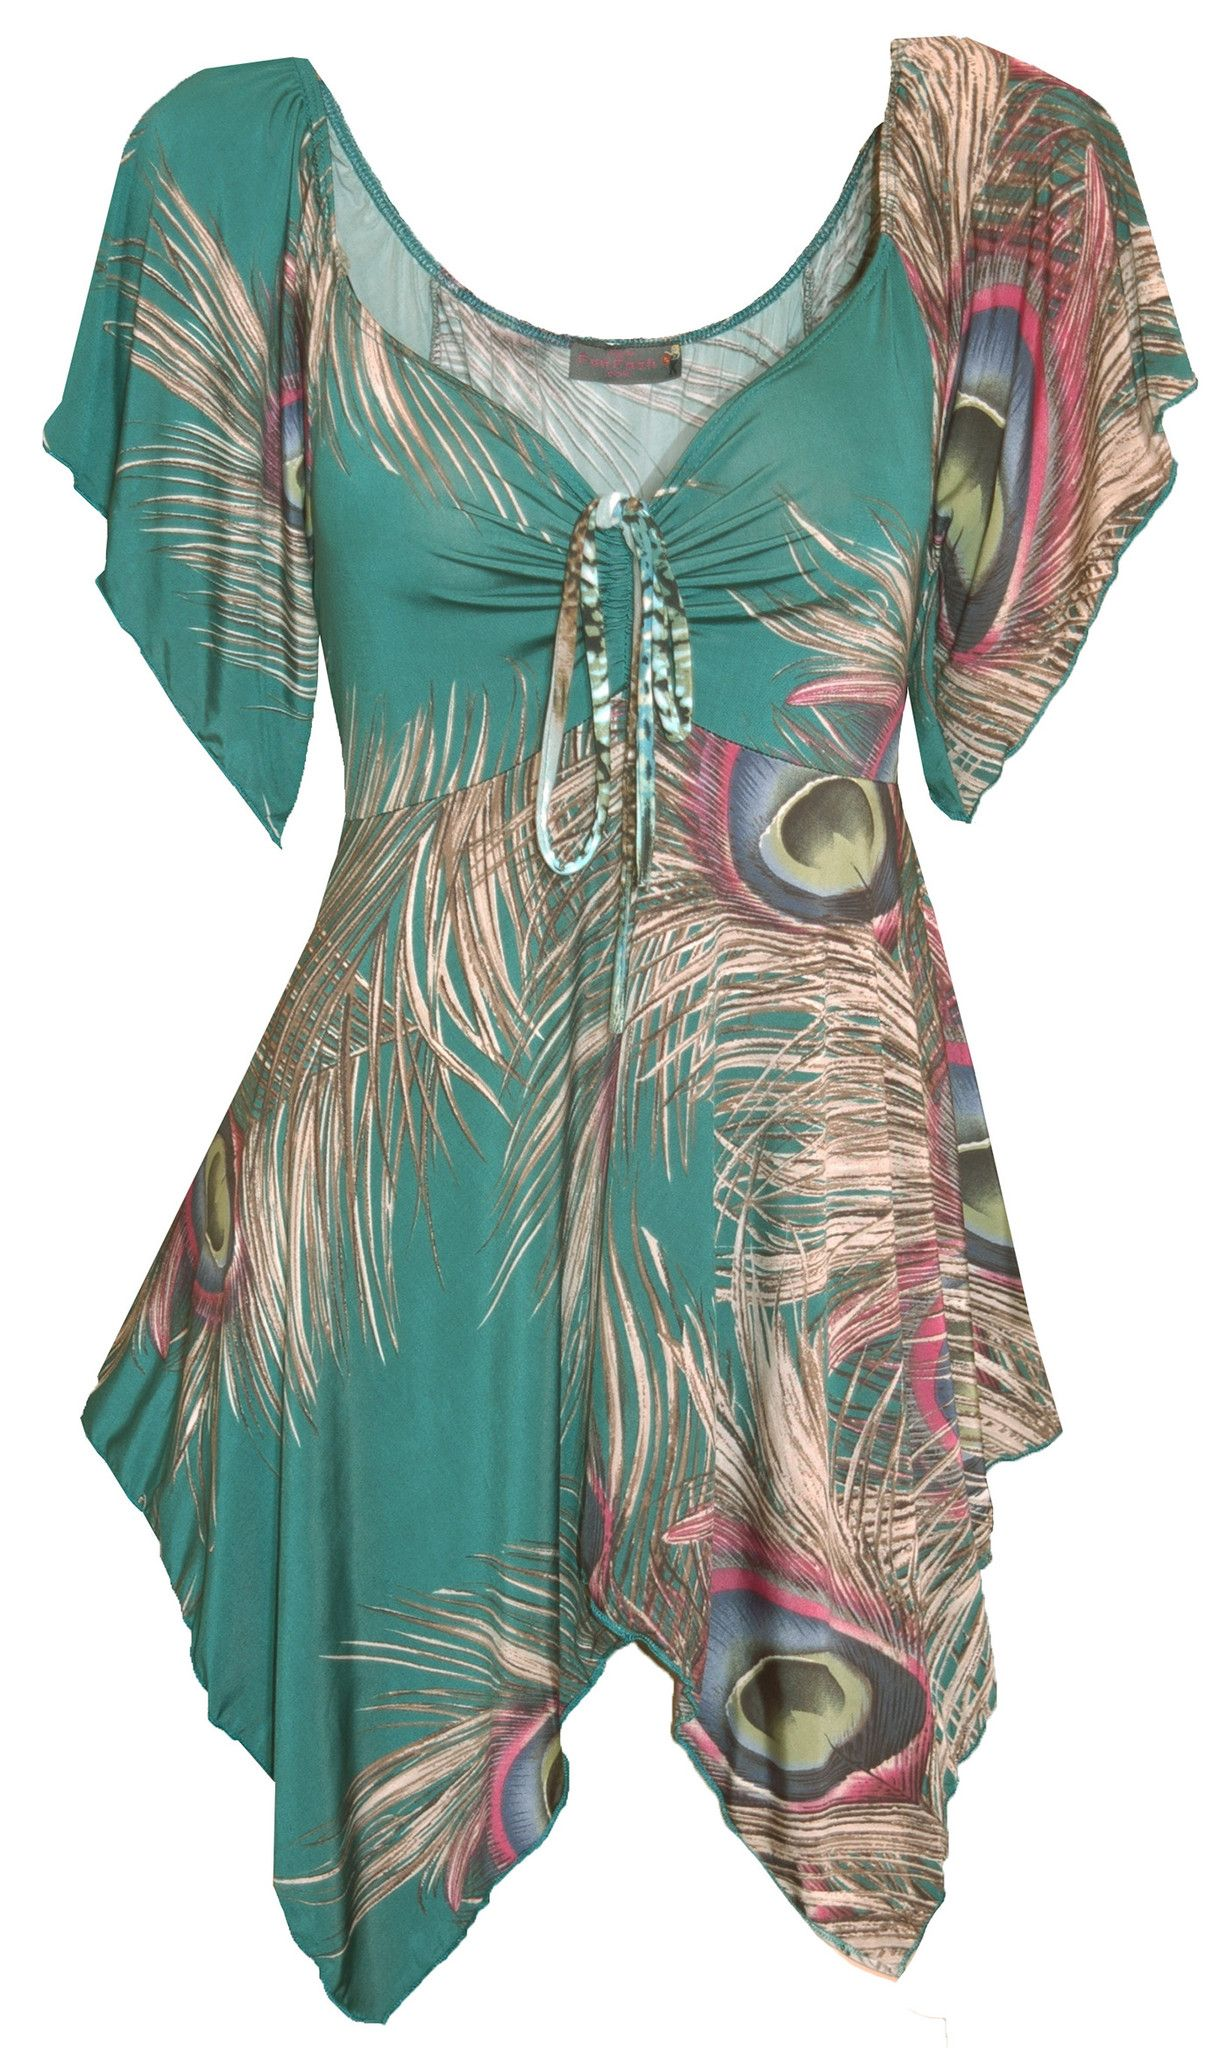 7712b0d98dae Funfash Plus Size Jade Green Peacock Top New Women's Top Shirt Blouse